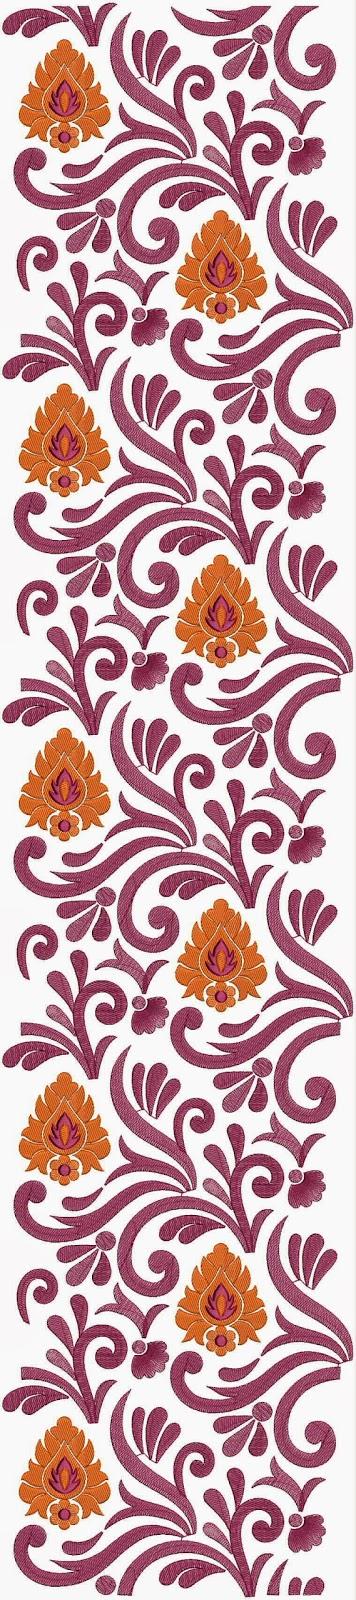 Indian Designs Patterns Latest anarkali designs for: galleryhip.com/indian-designs-patterns.html